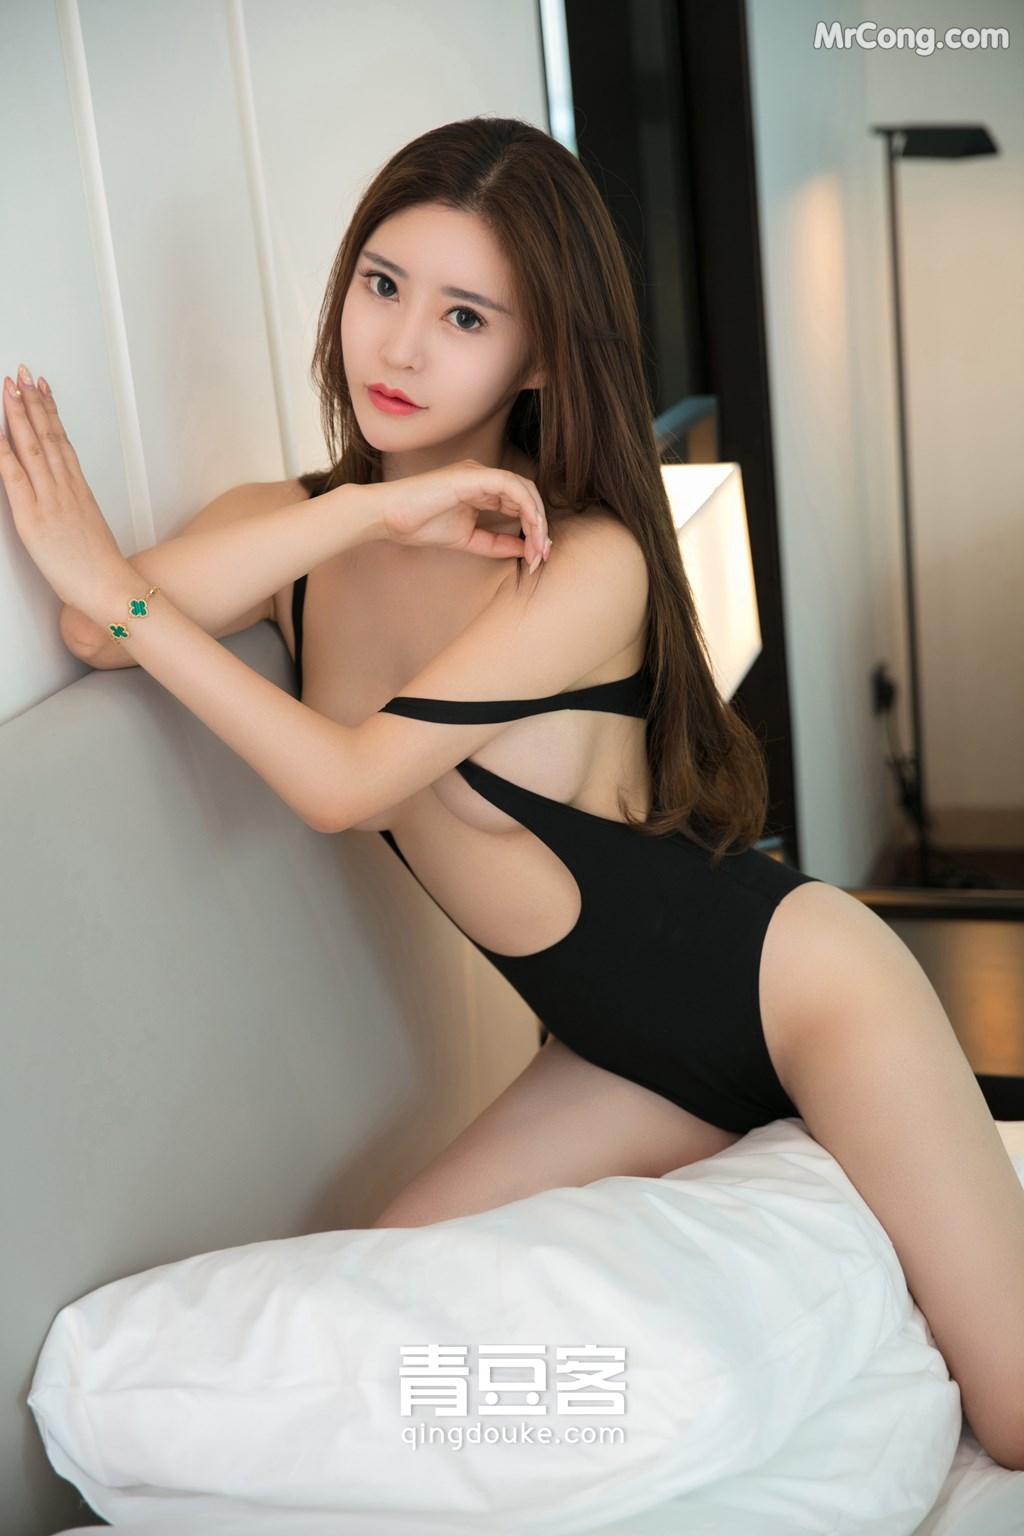 Image QingDouKe-2017-11-12-Tong-Man-MrCong.com-007 in post QingDouKe 2017-11-12: Người mẫu Tong Man (佟蔓) (50 ảnh)